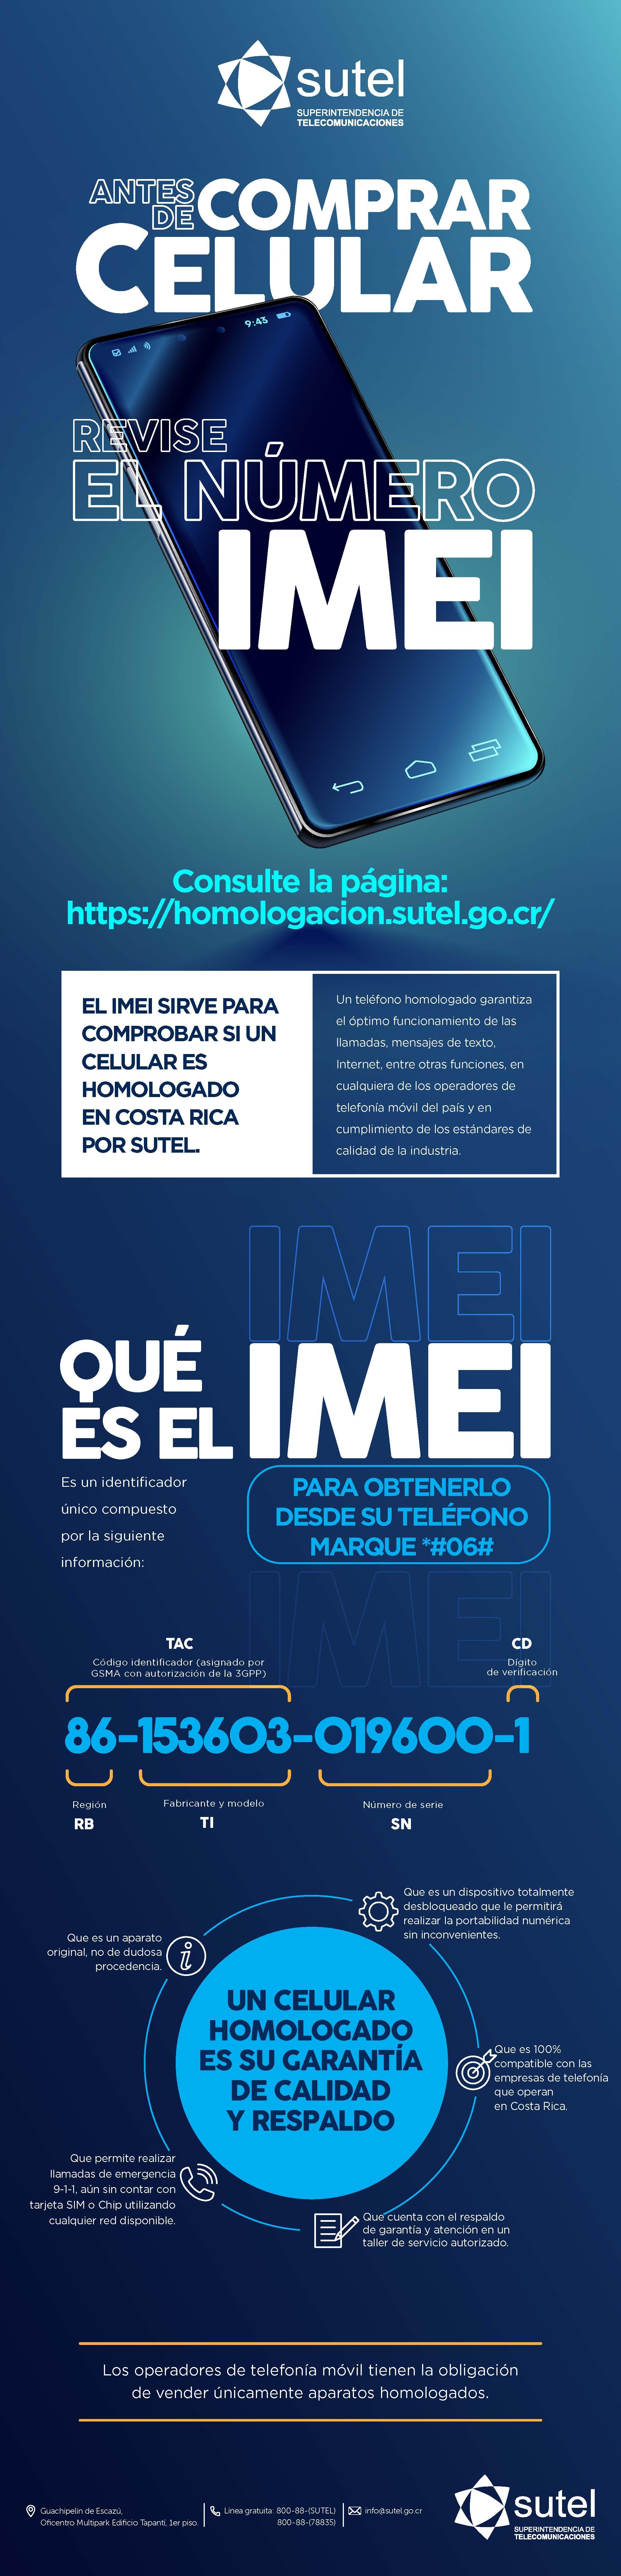 Infografía IMEI SUTEL